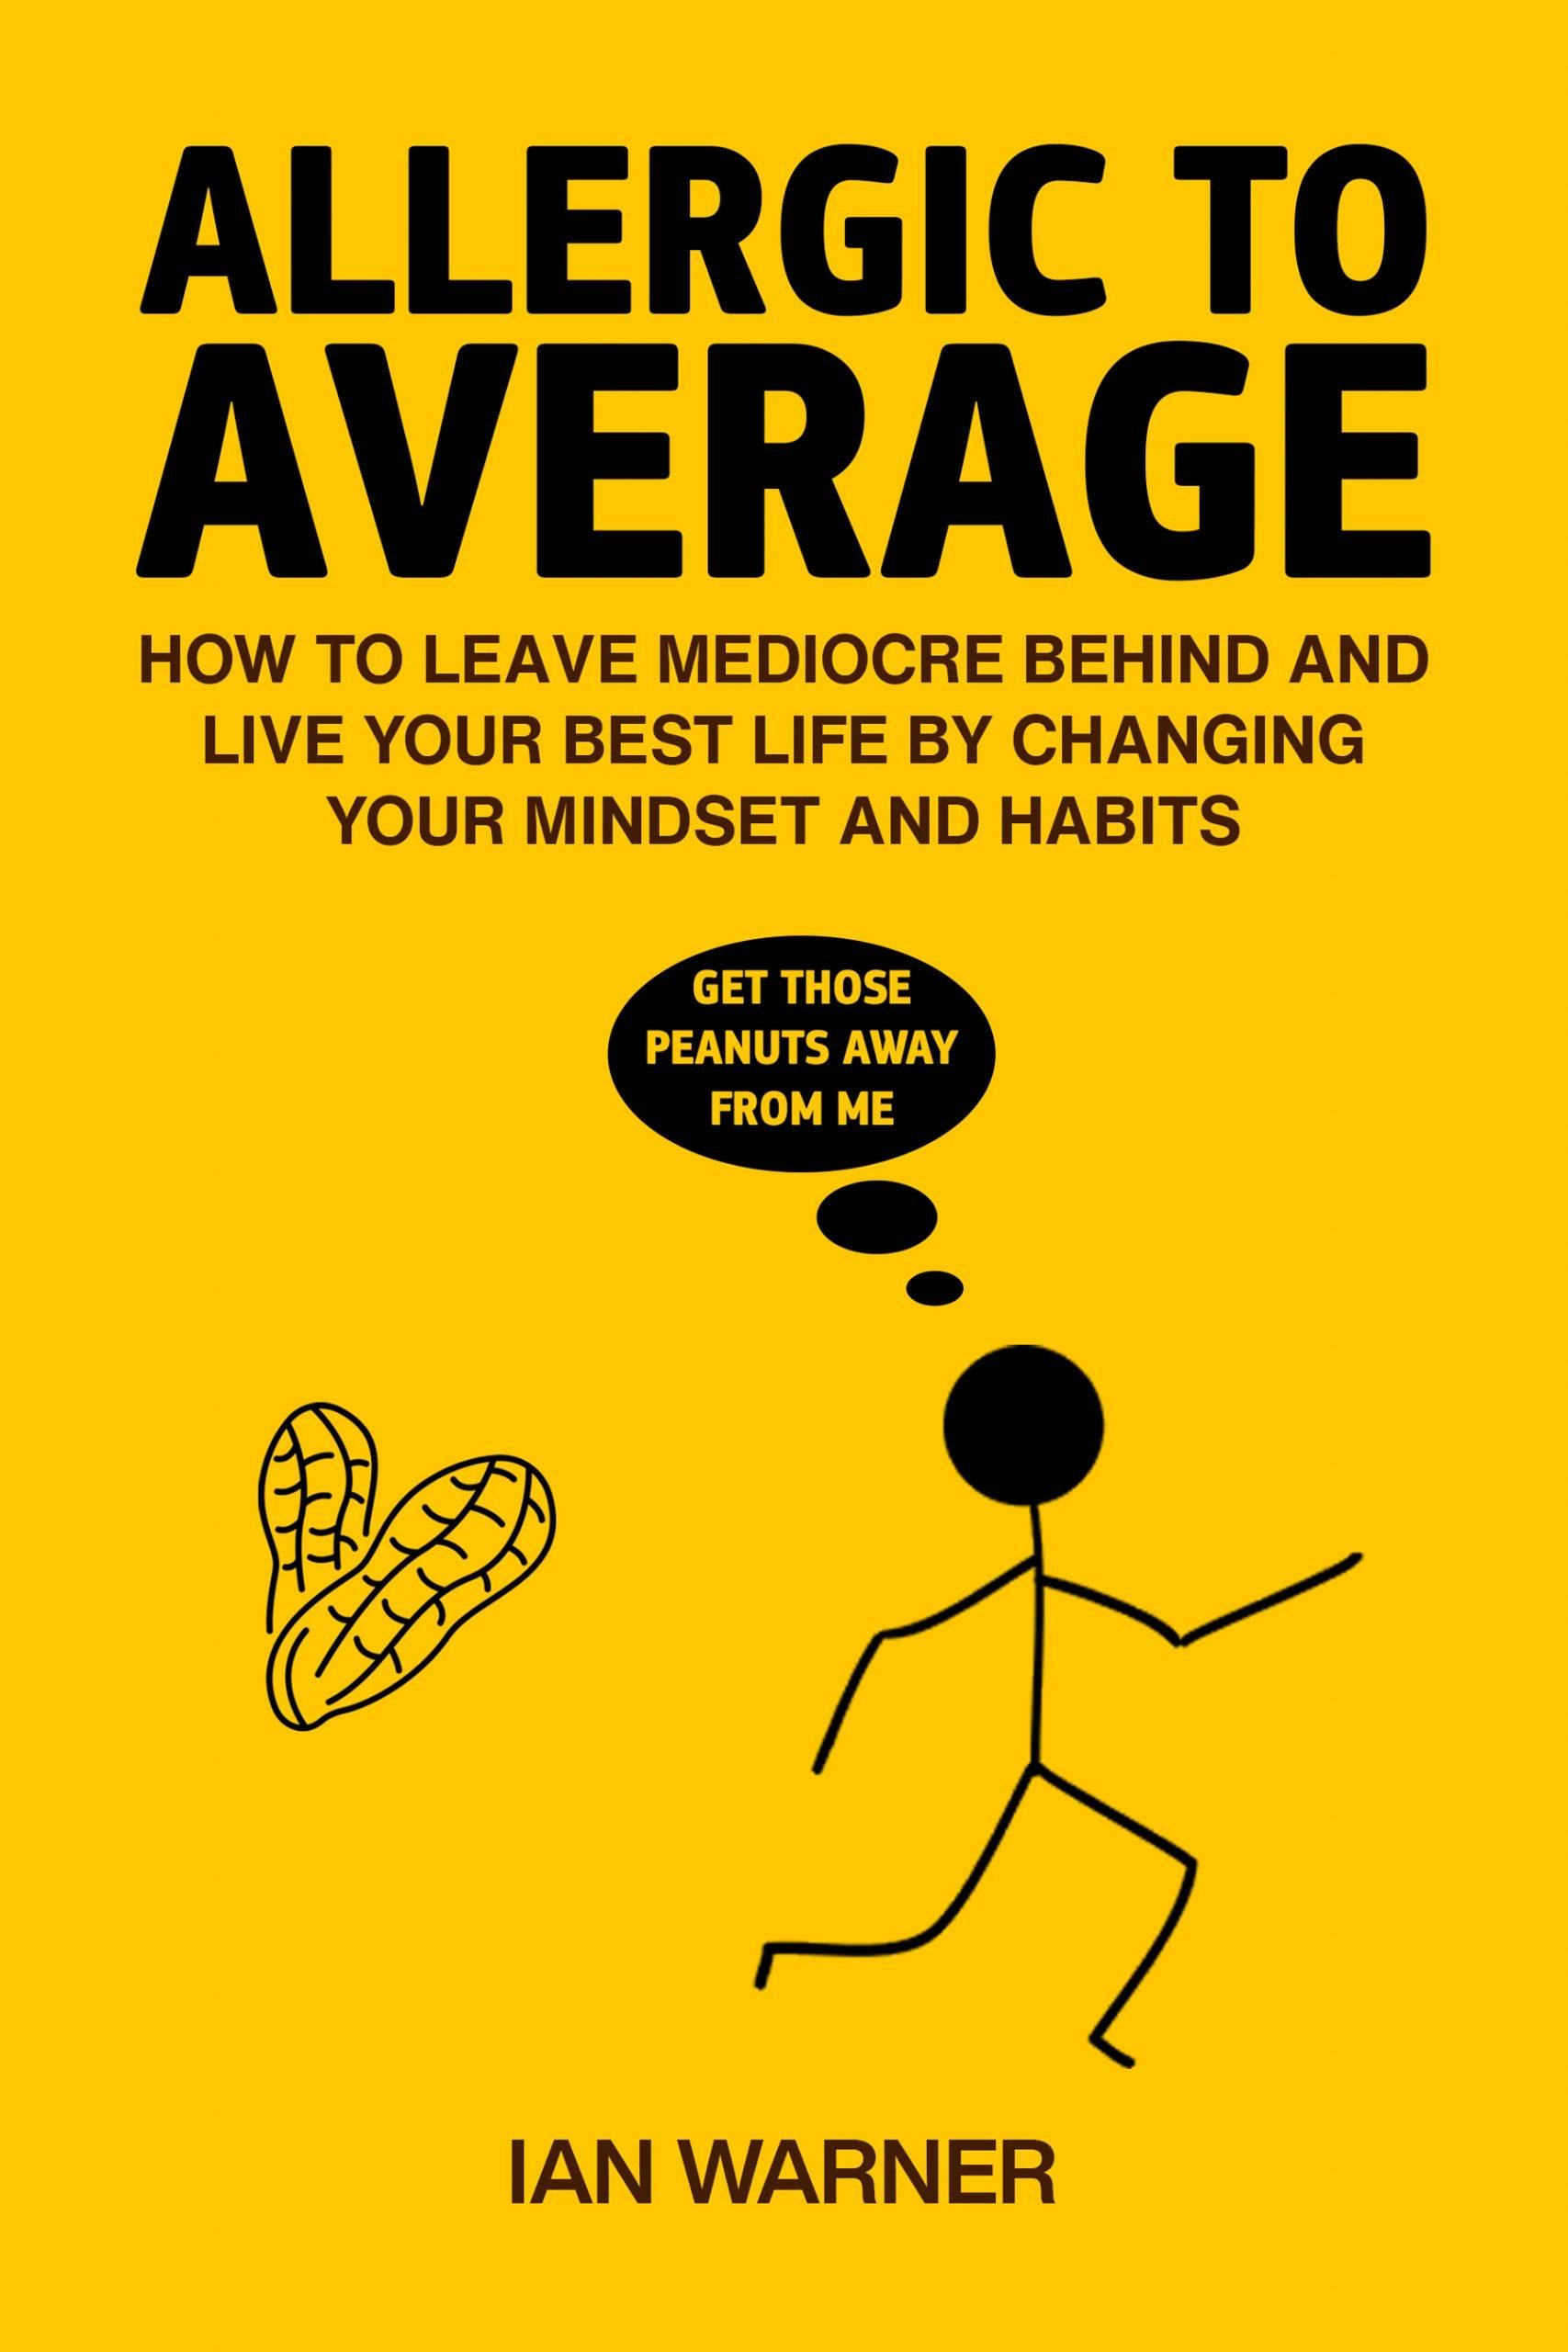 Allergic to Average